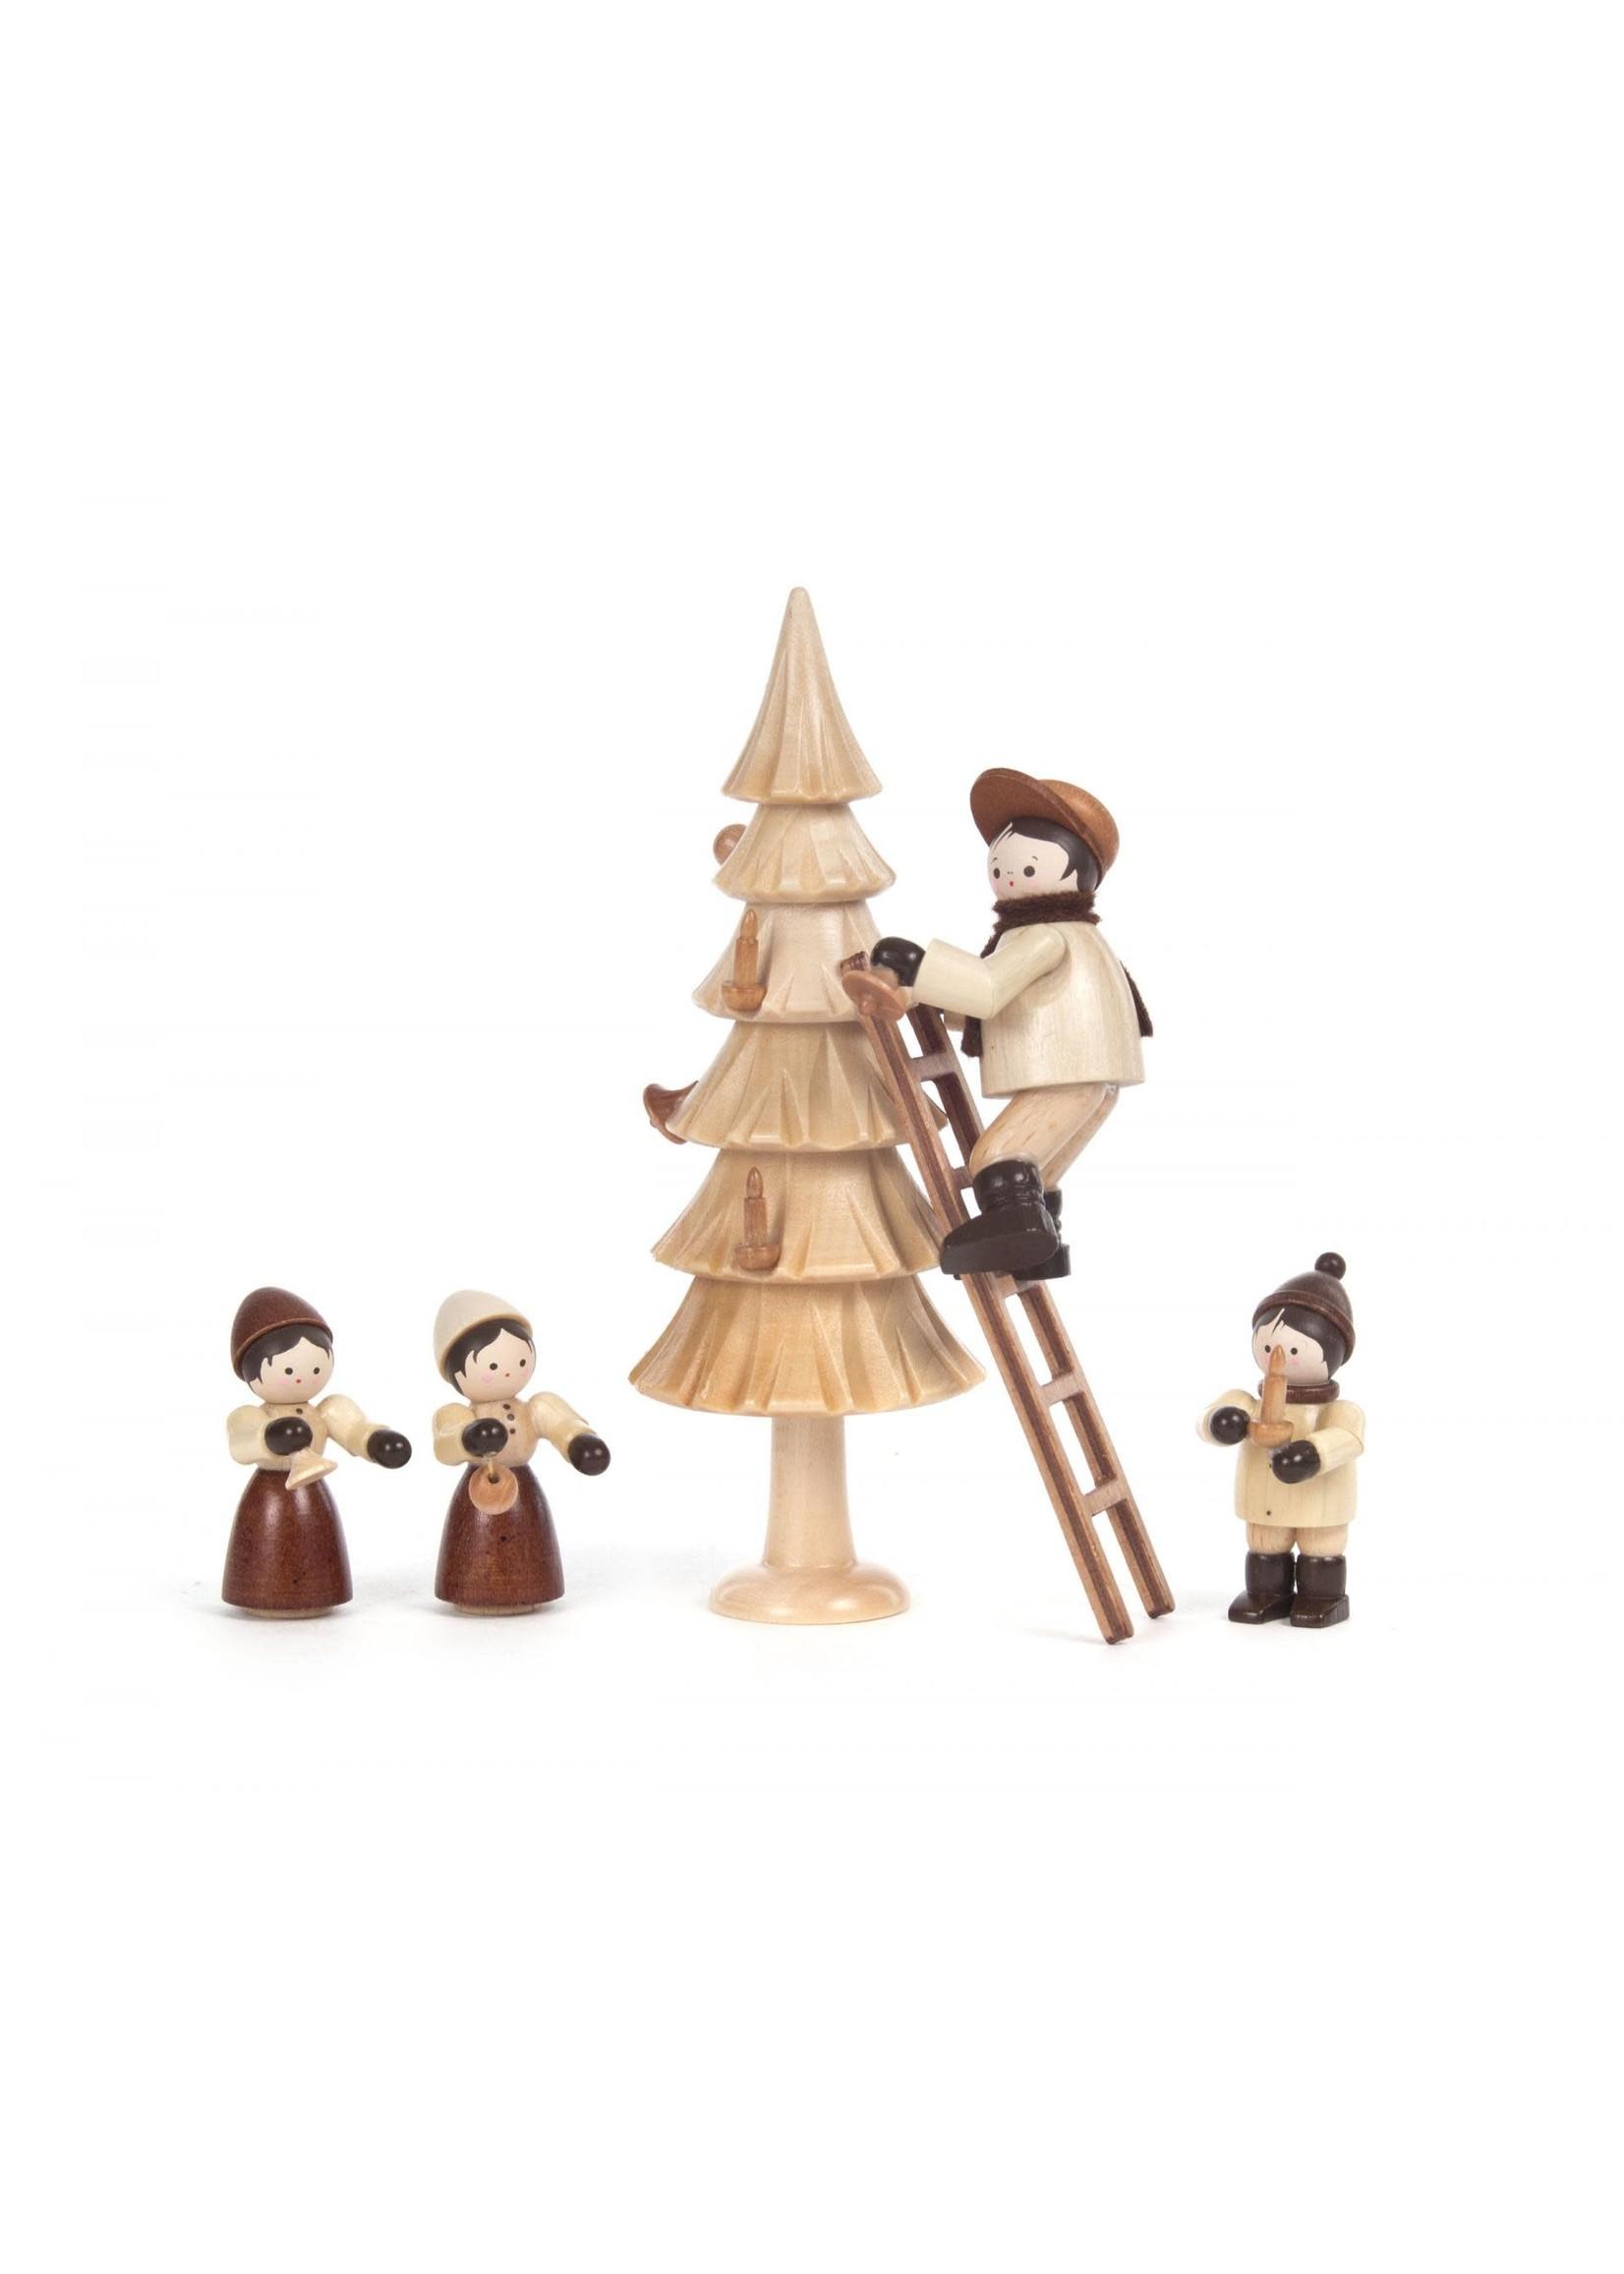 Christmas Tree Decoration (5 piece set)